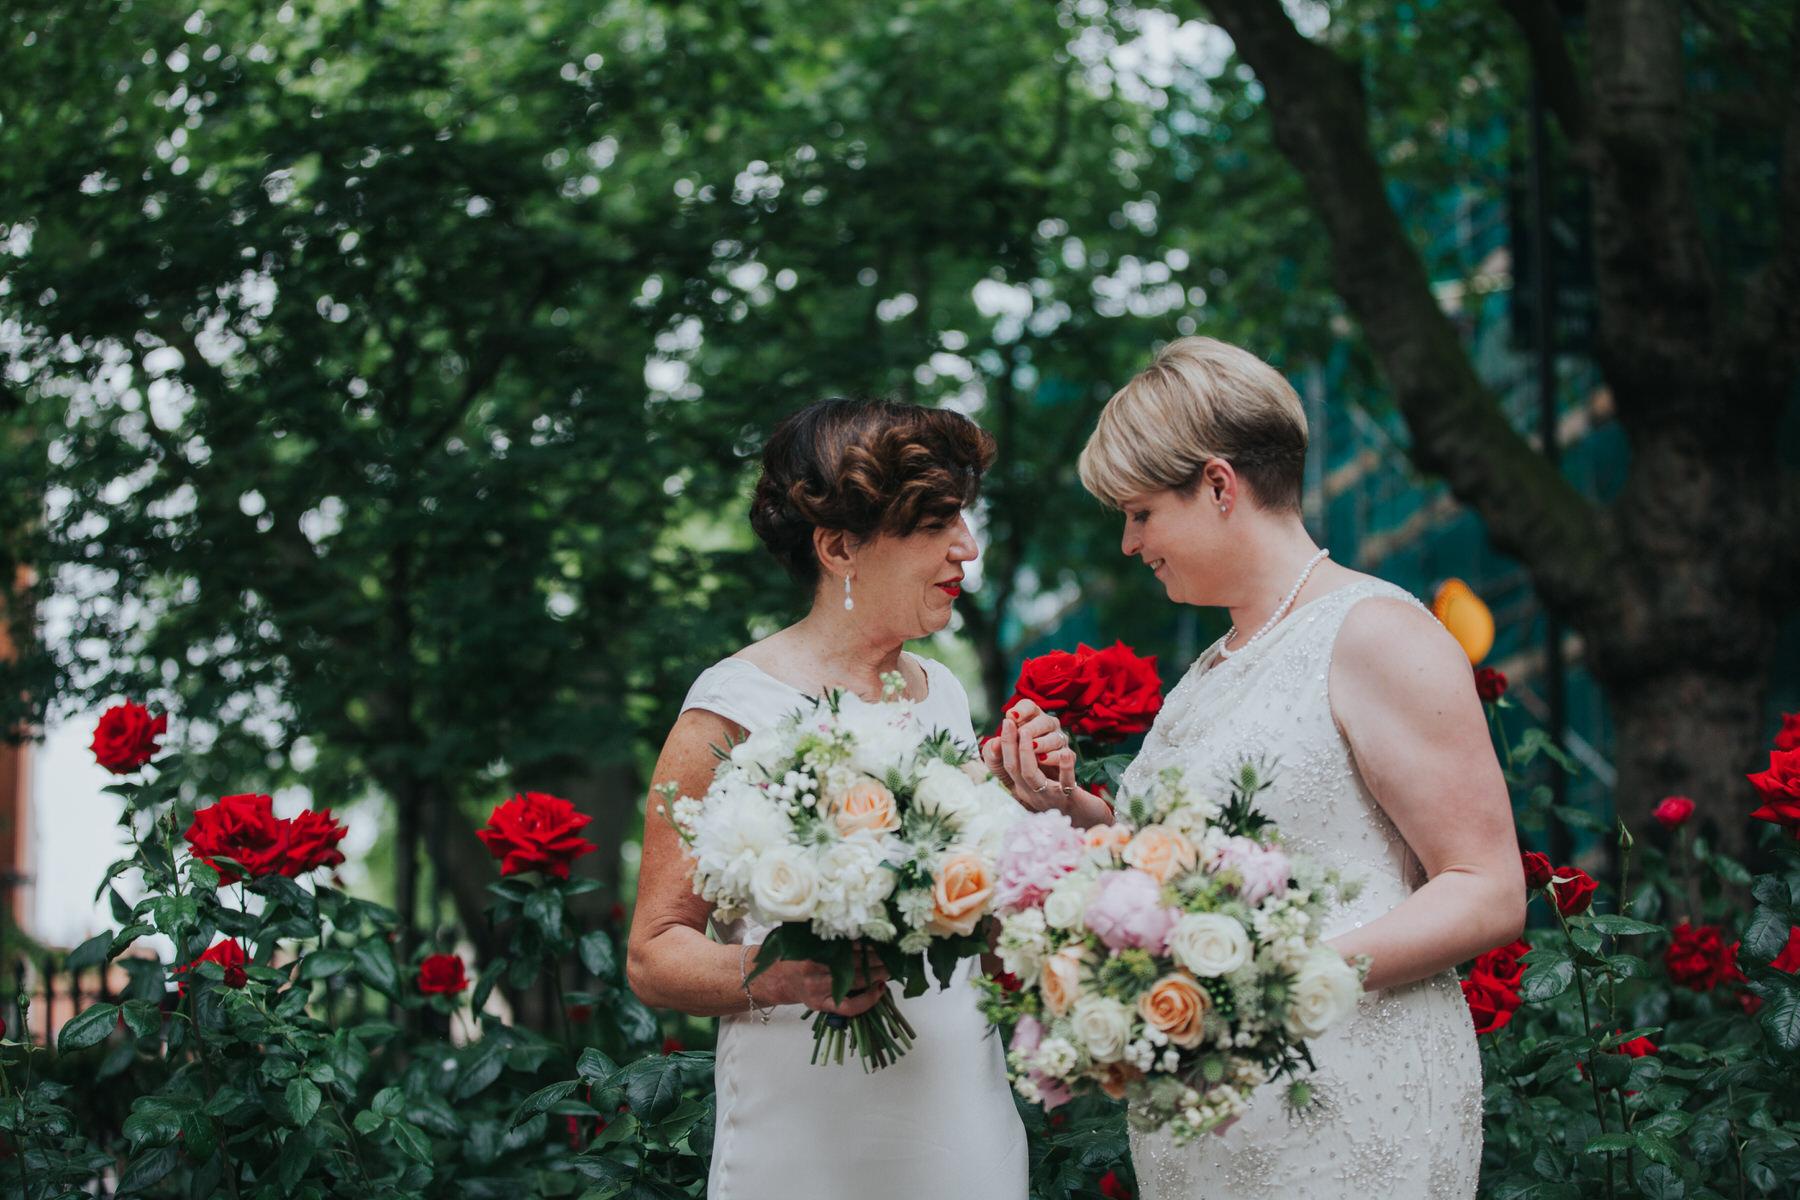 149 two brides couple portraits Islington park red roses.jpg